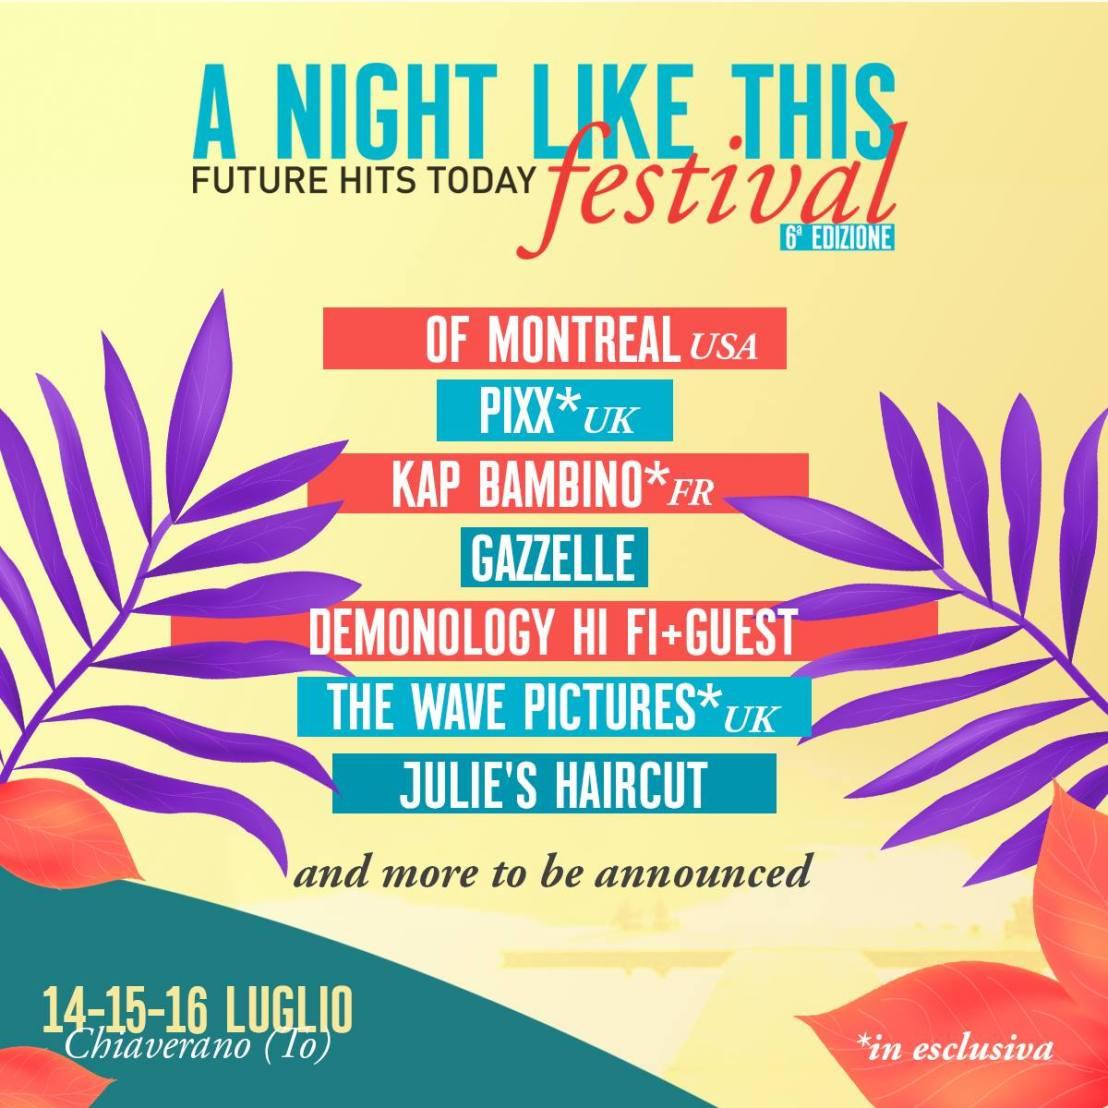 A Night Like This (Chiaverano) |luglio